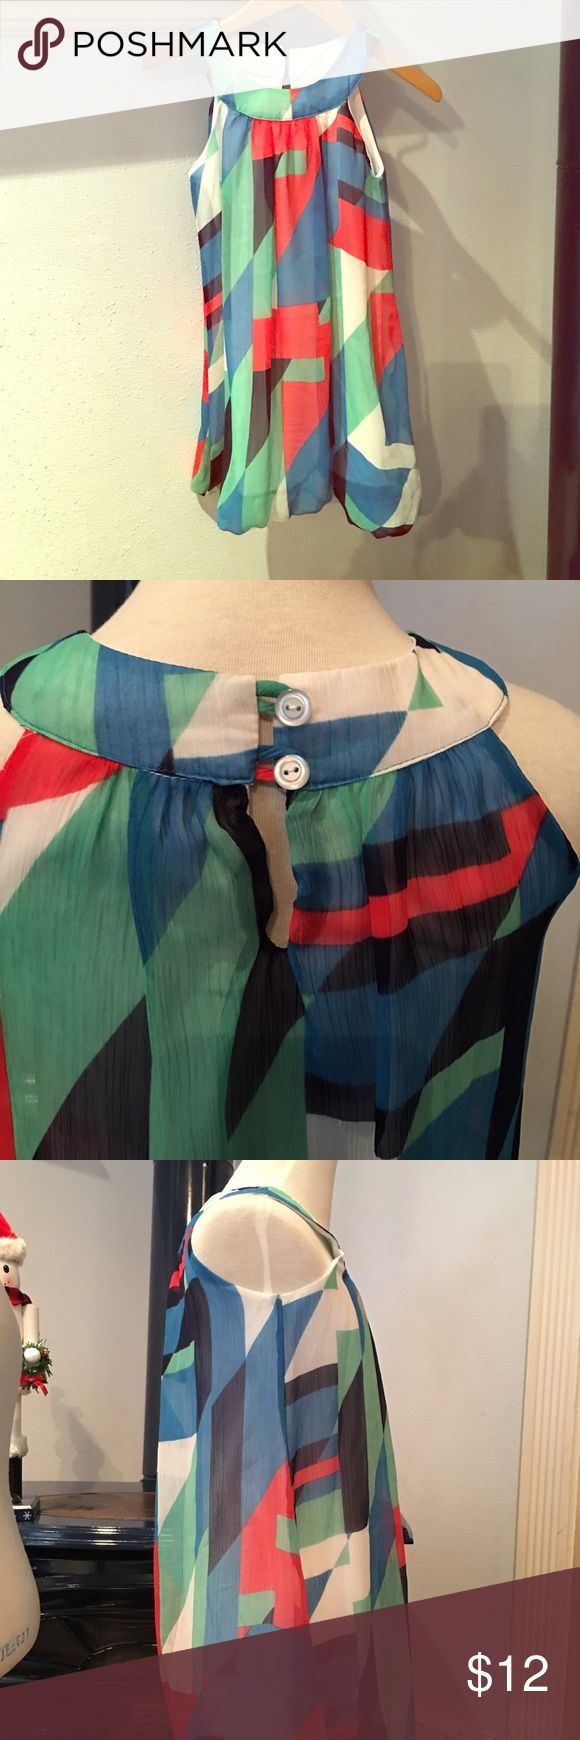 Adorable NWT Plum Lined Retro Girls Dress Sz 5 👗 Super adorable lined dress. Sophisticated upscale boutique dress. NWOT Plum Dresses Formal